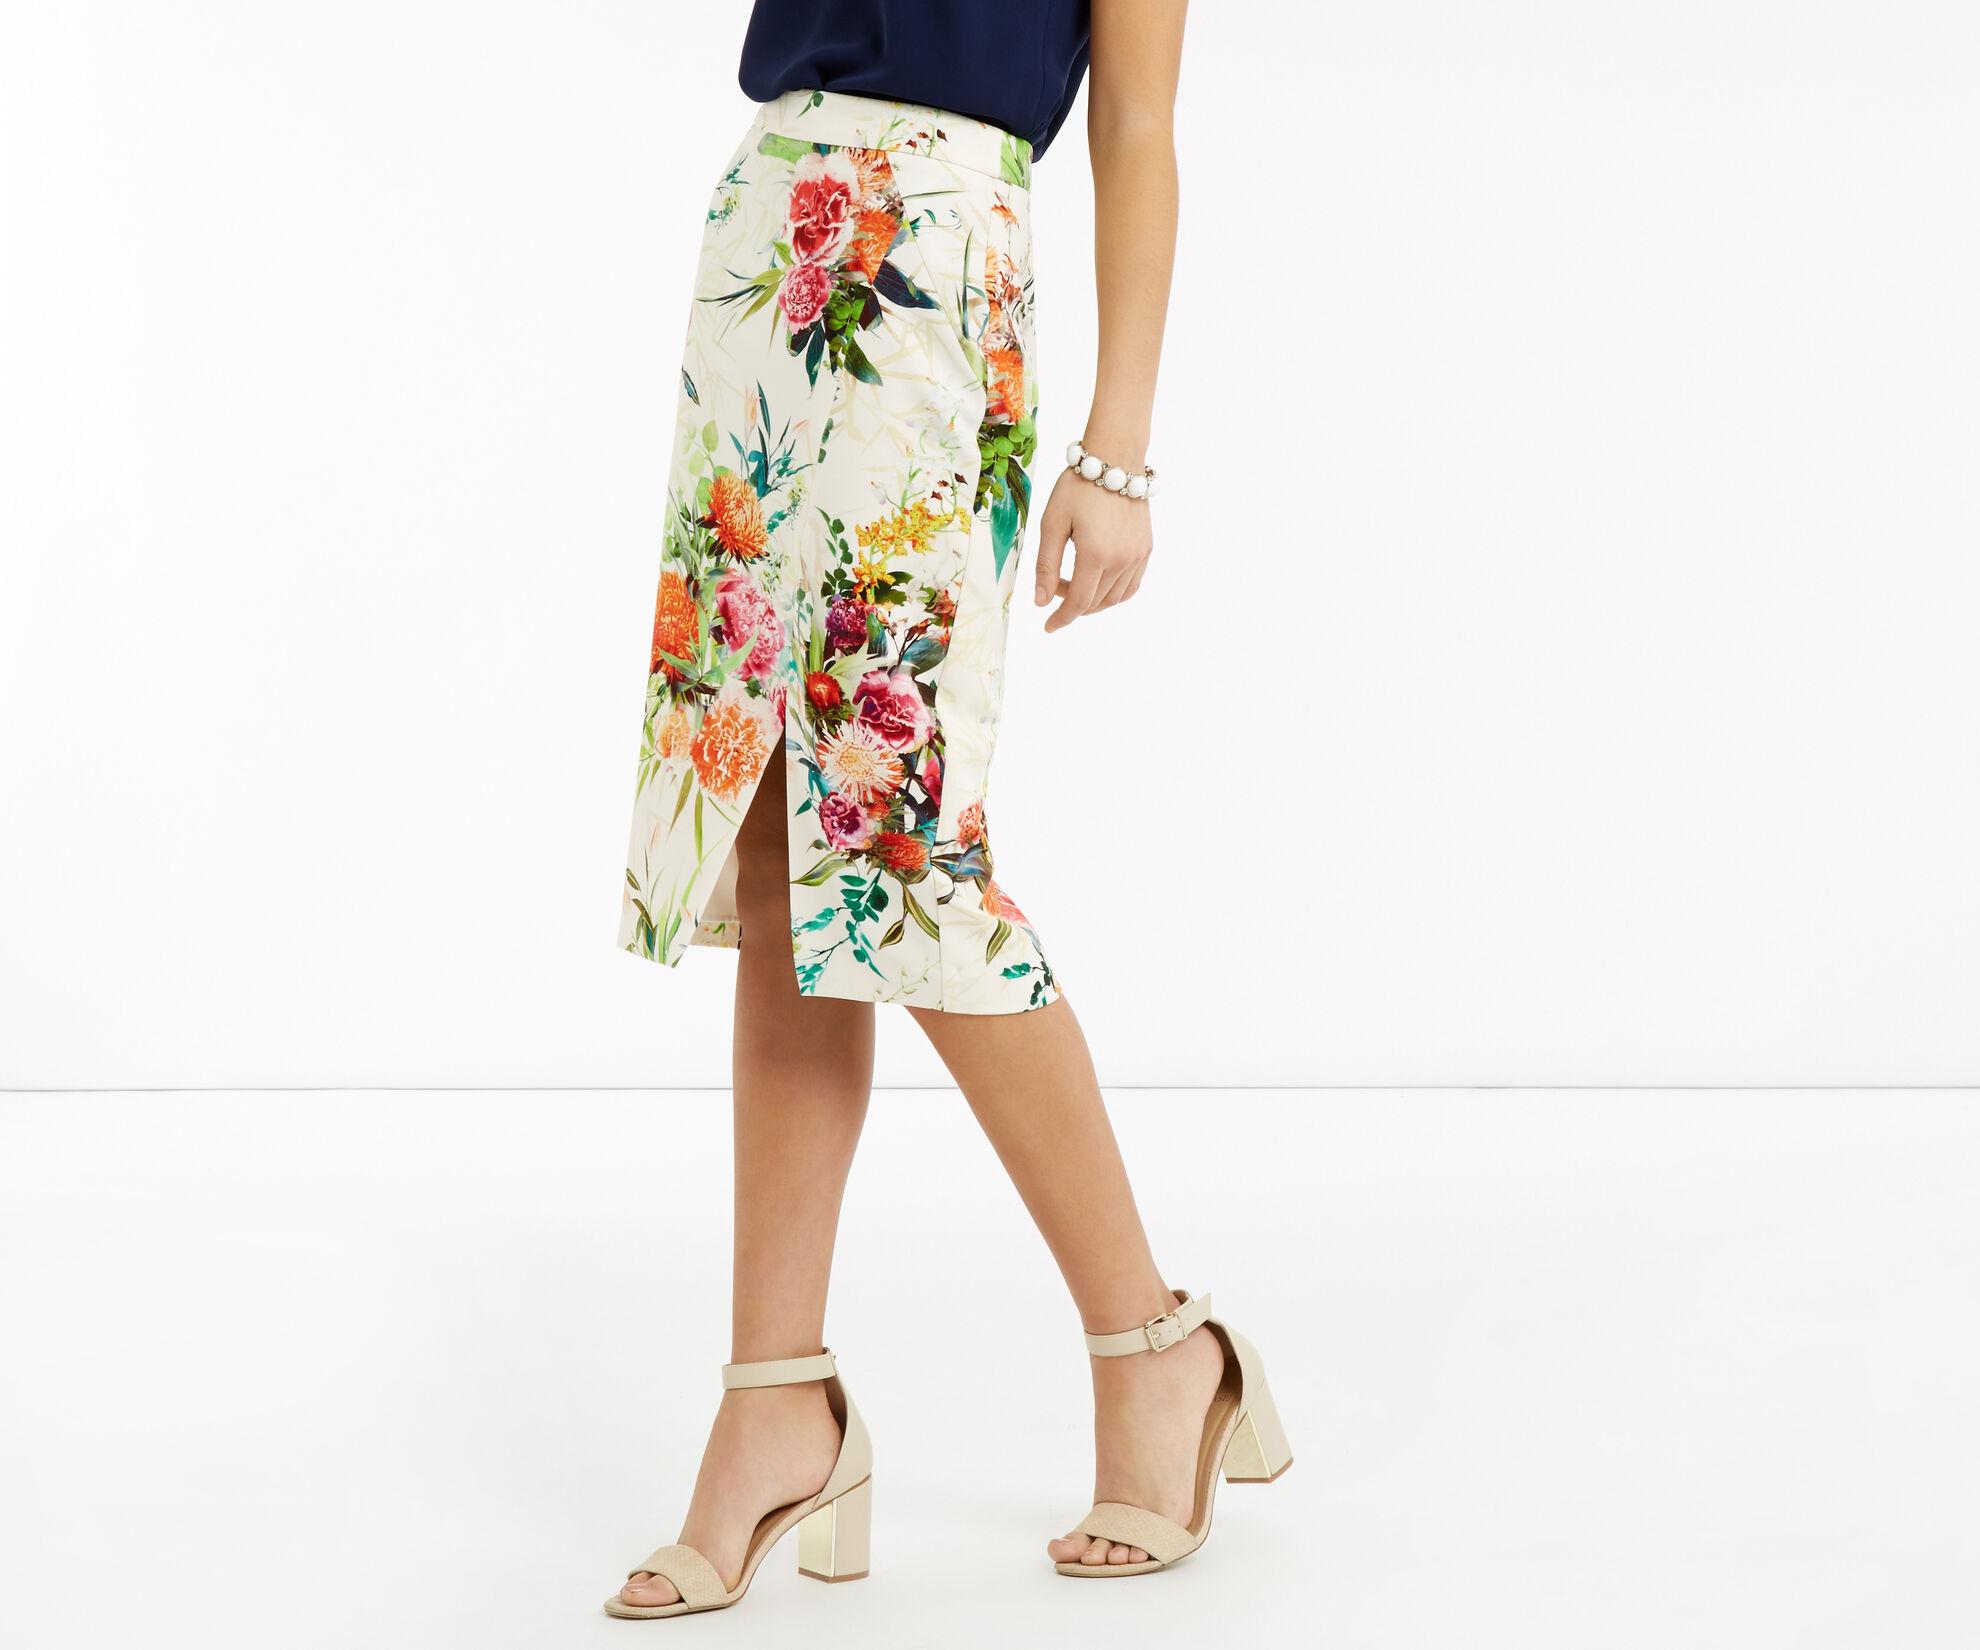 floral pencil skirt - photo #38